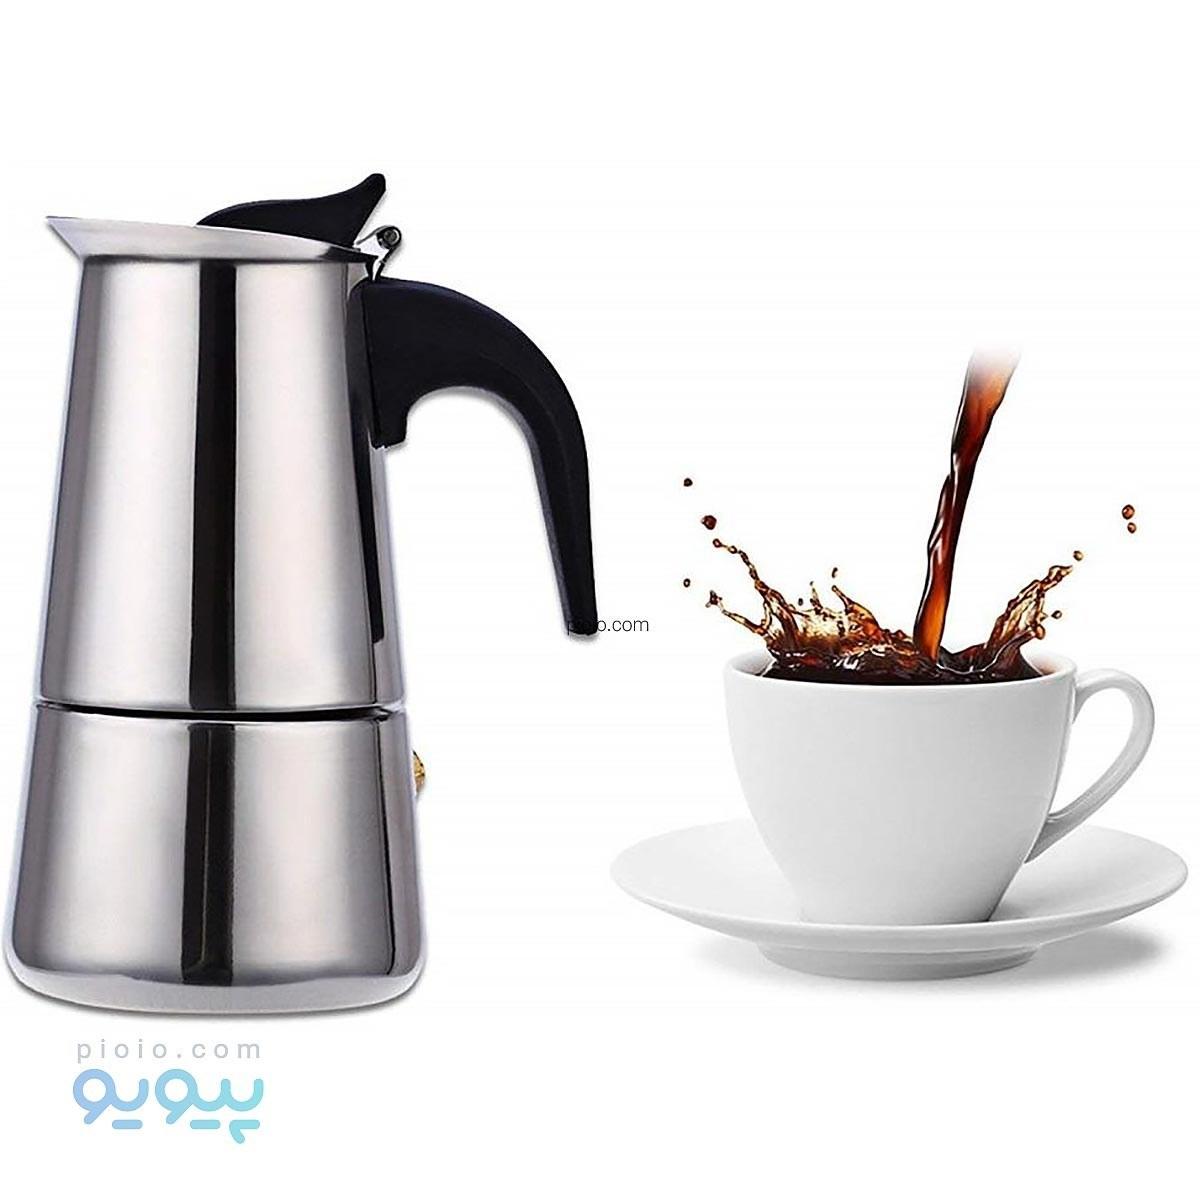 تصویر قهوه جوش اسپرسو ساز استیل ۲ کاپ